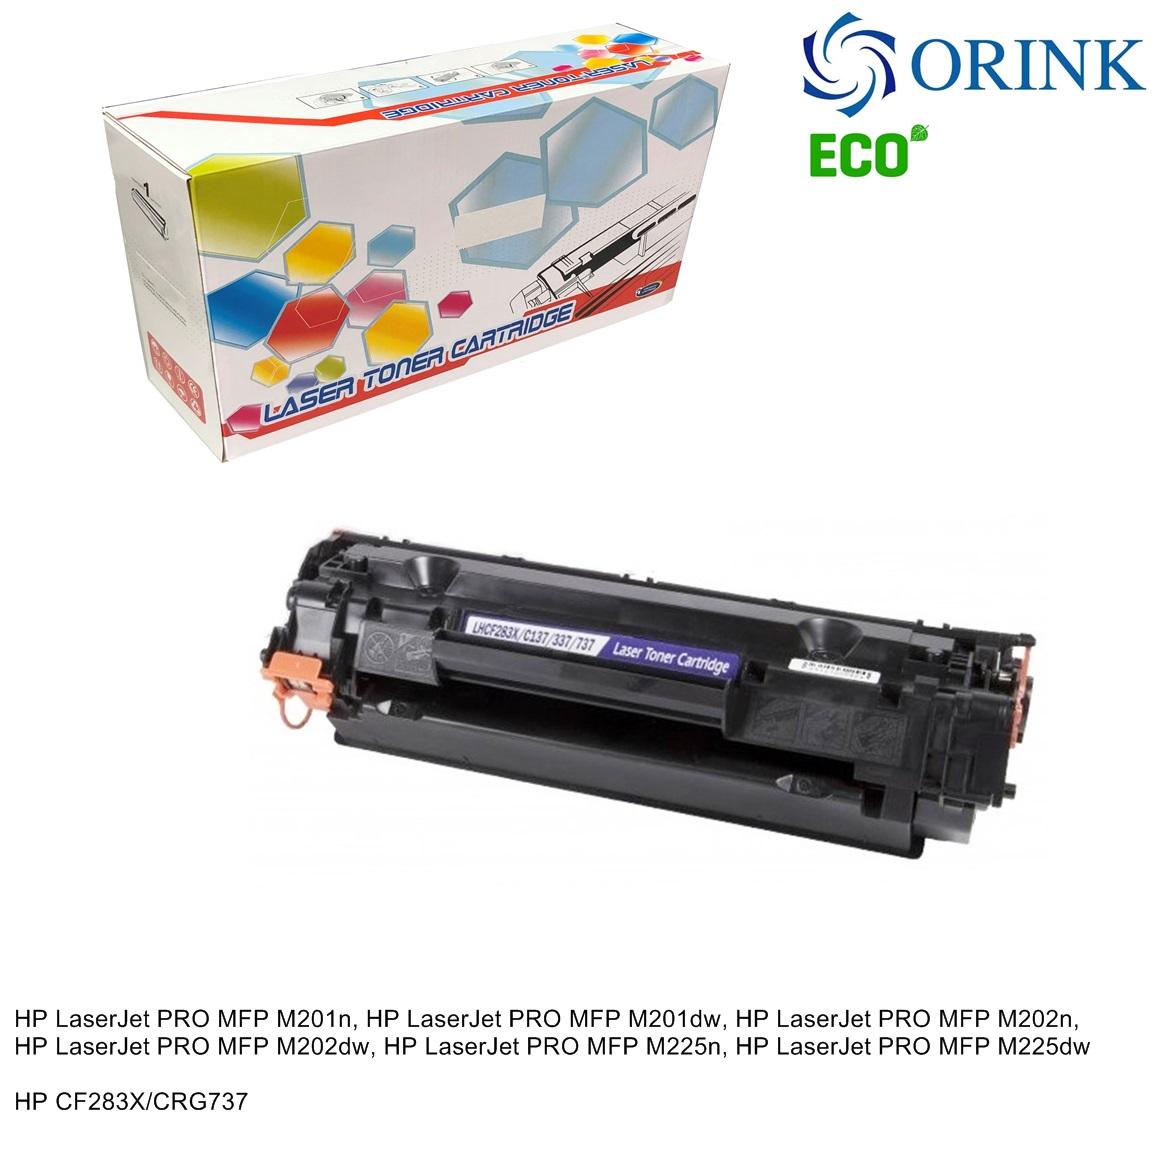 HP CF283X/CRG737 (2.2K) ORINK ECO